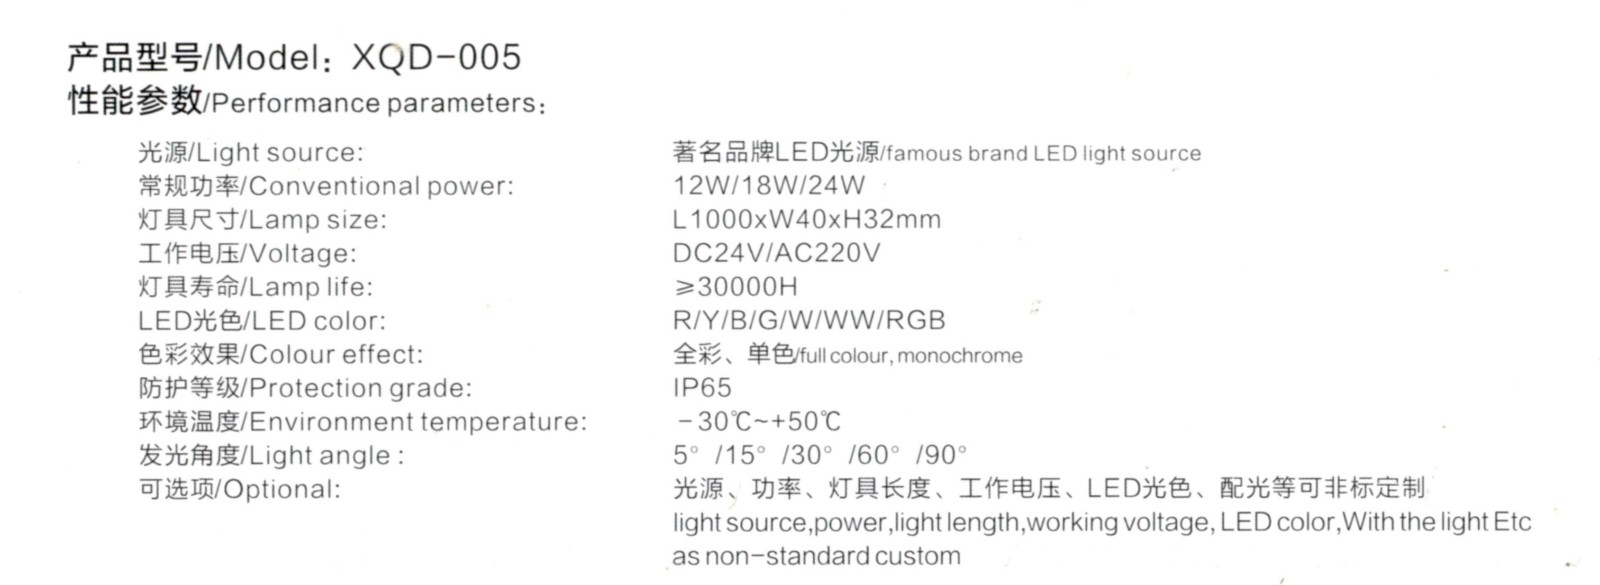 LED洗墙灯Model∶XQD-005参数.jpg